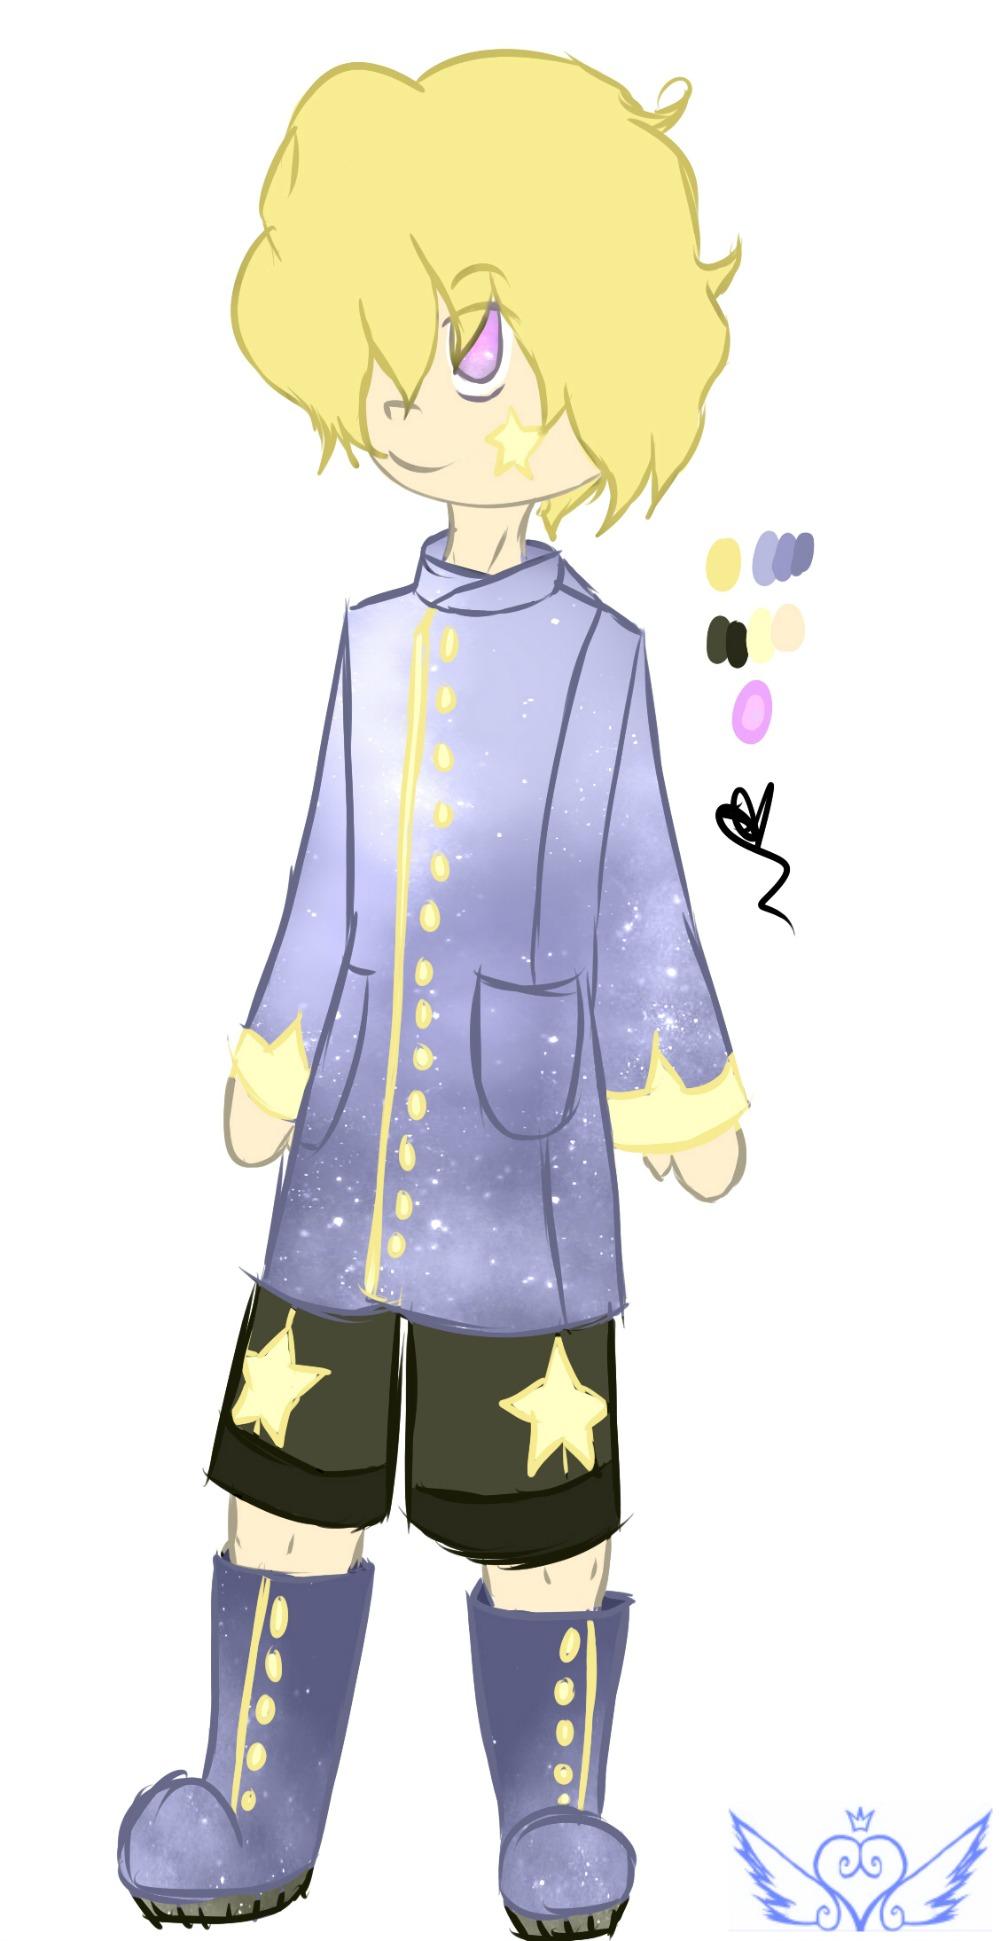 [Galaxies] Star Boy  by OpalesquePrincess